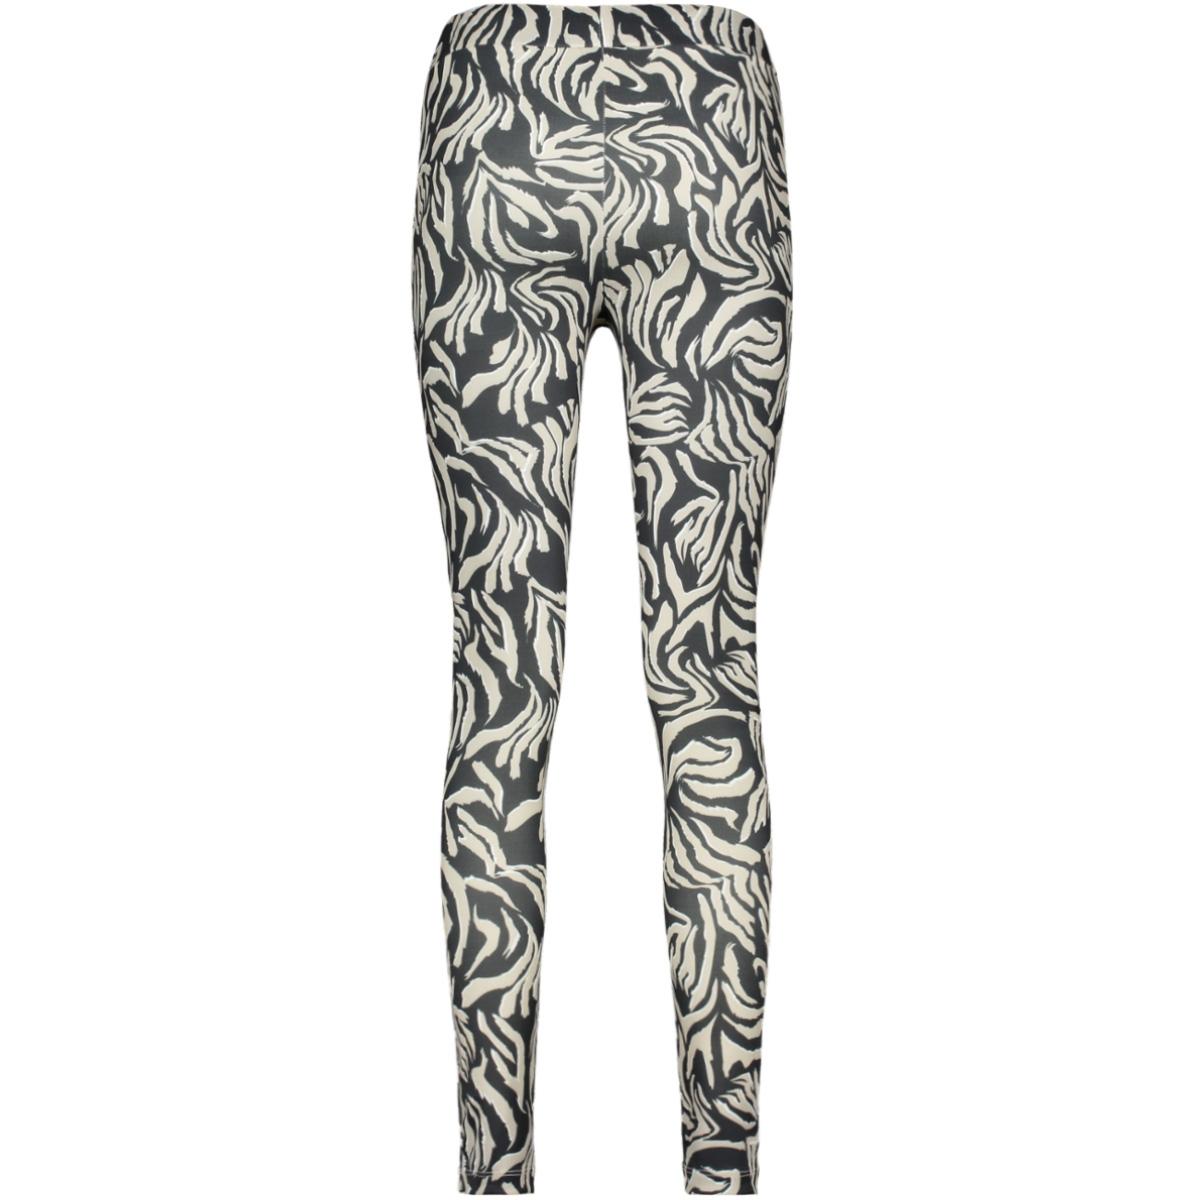 ciska animal legging 201 zoso legging 5000 as is